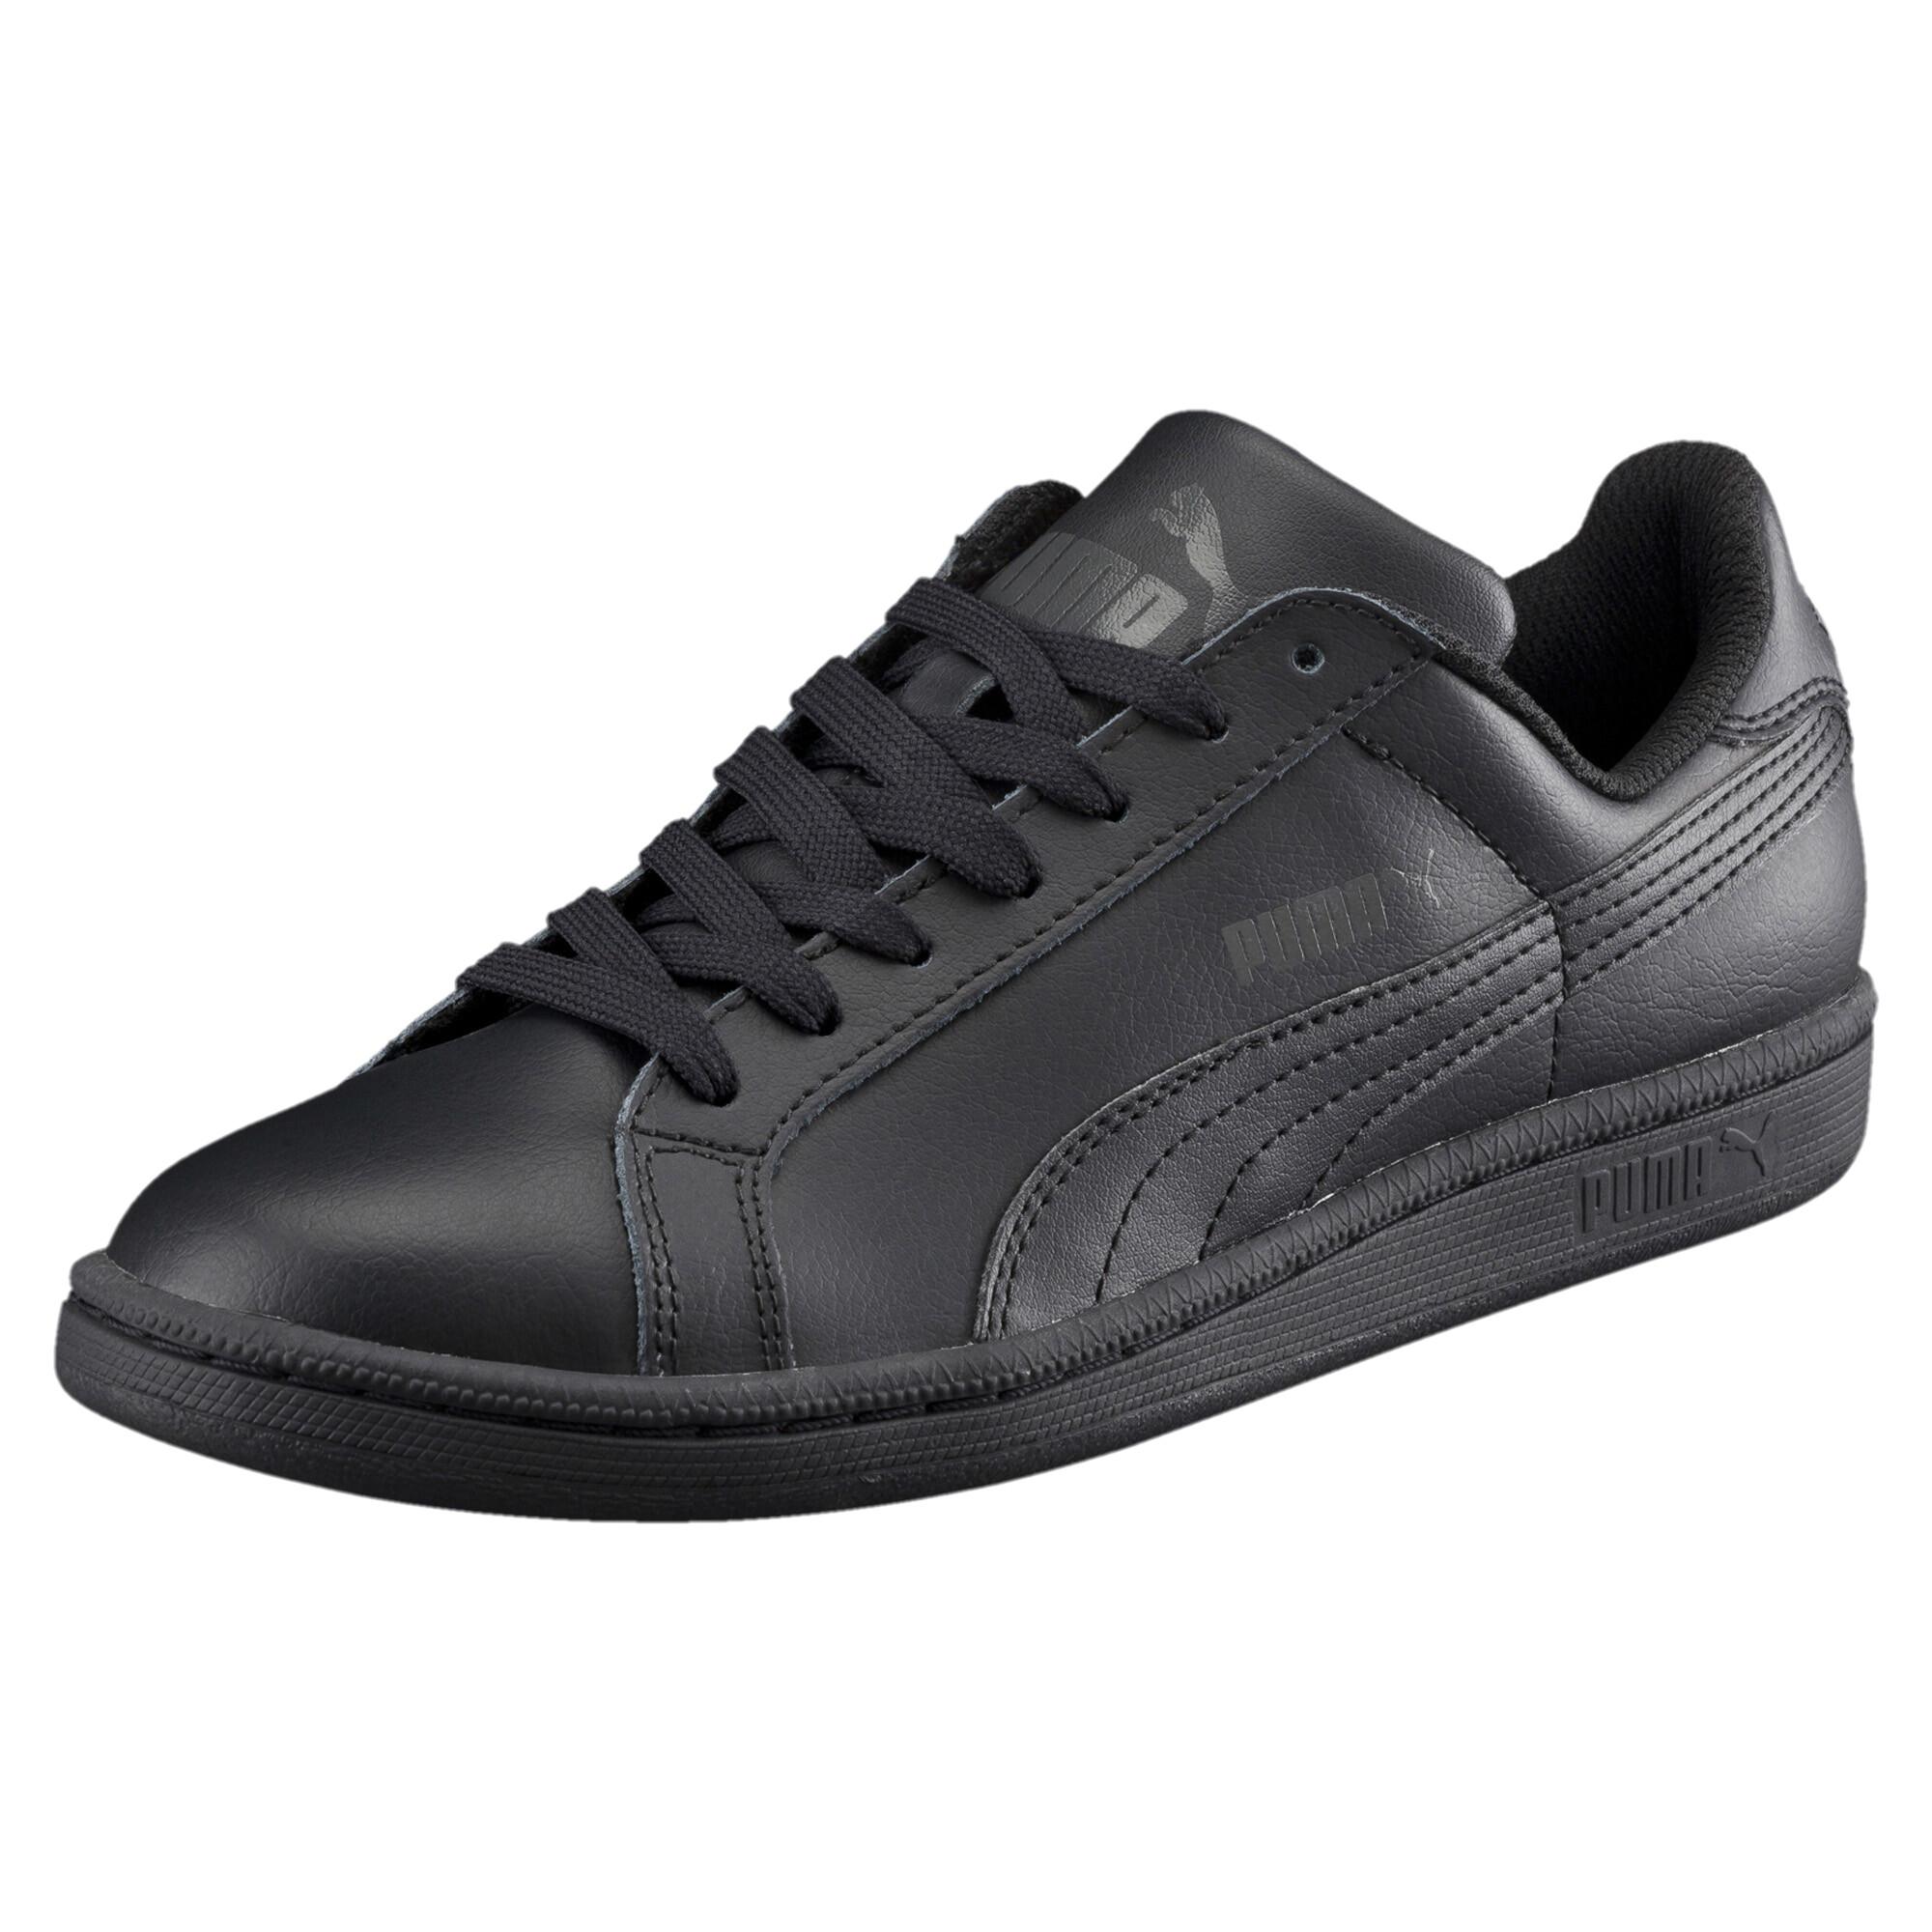 PUMA-Smash-Jr-Sneaker-Unisex-Schuhe-Kinder-Neu Indexbild 4